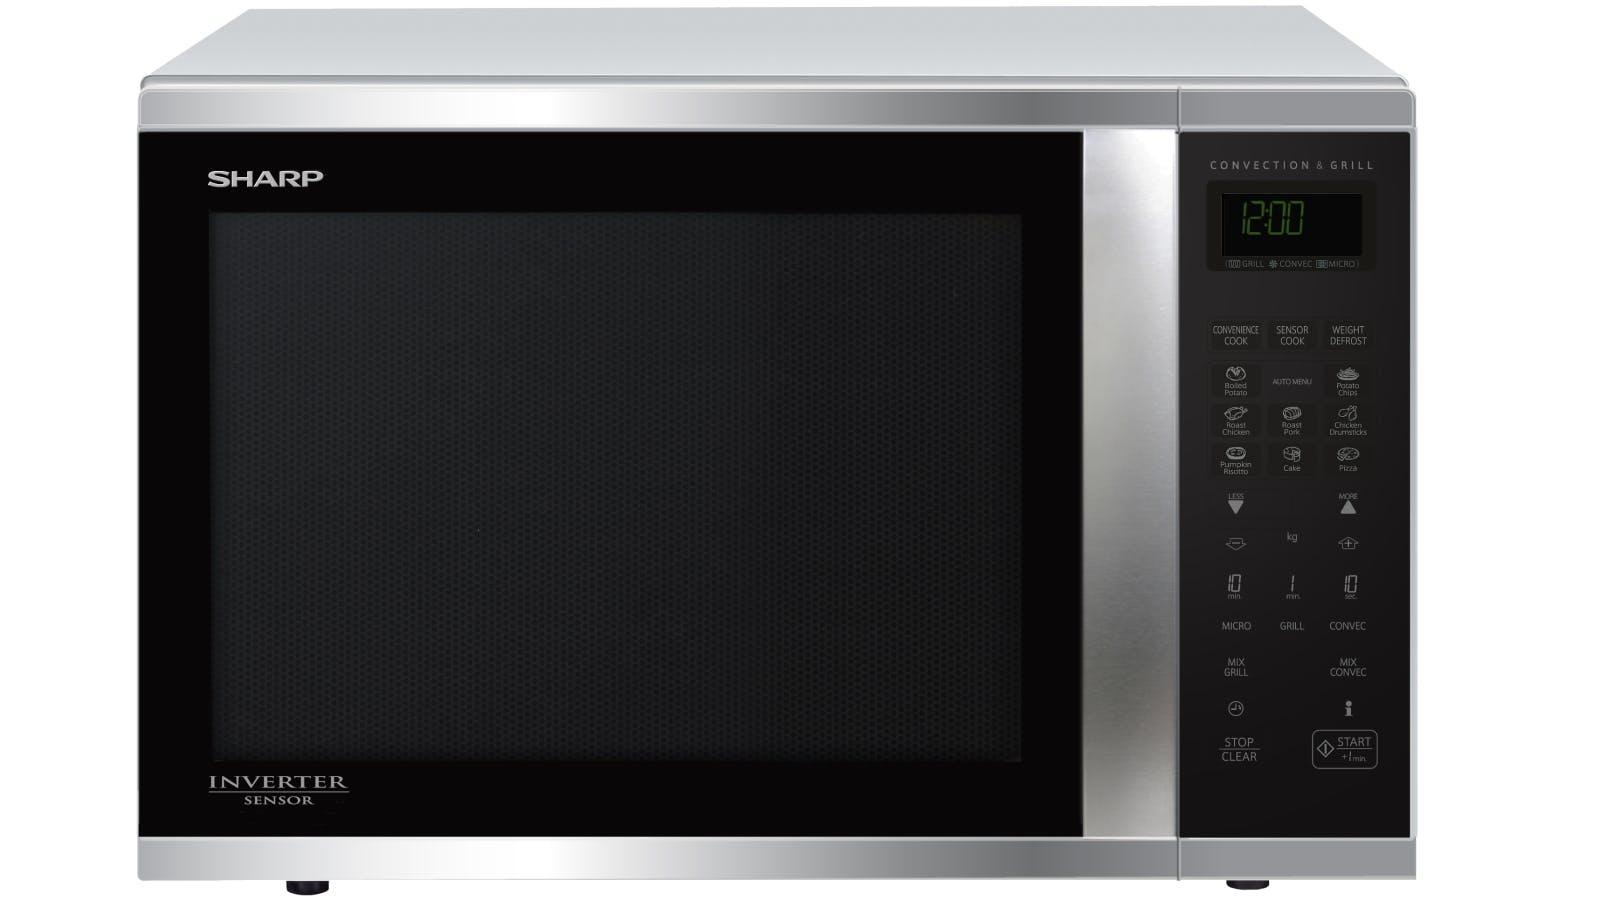 Microwave Oven Stainless Steel Bestmicrowave